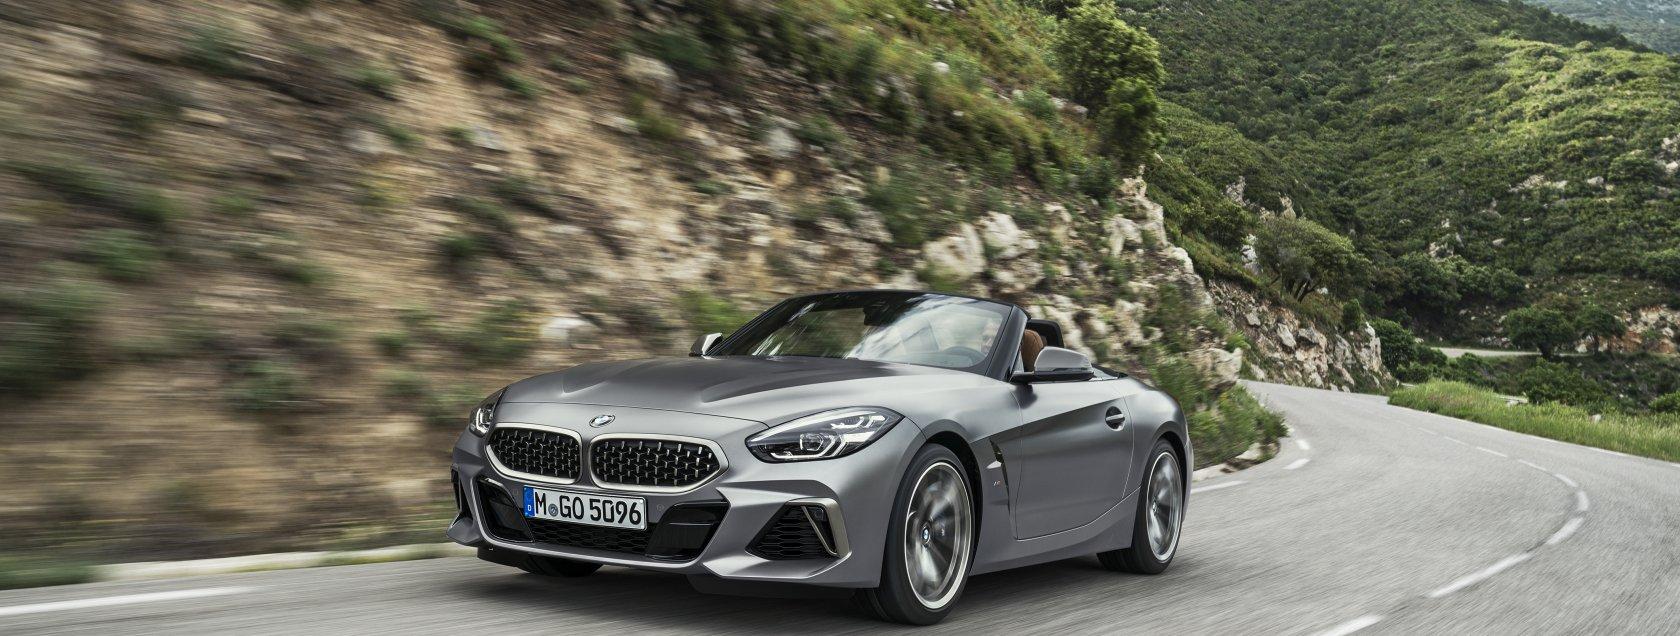 De nieuwe BMW Z4